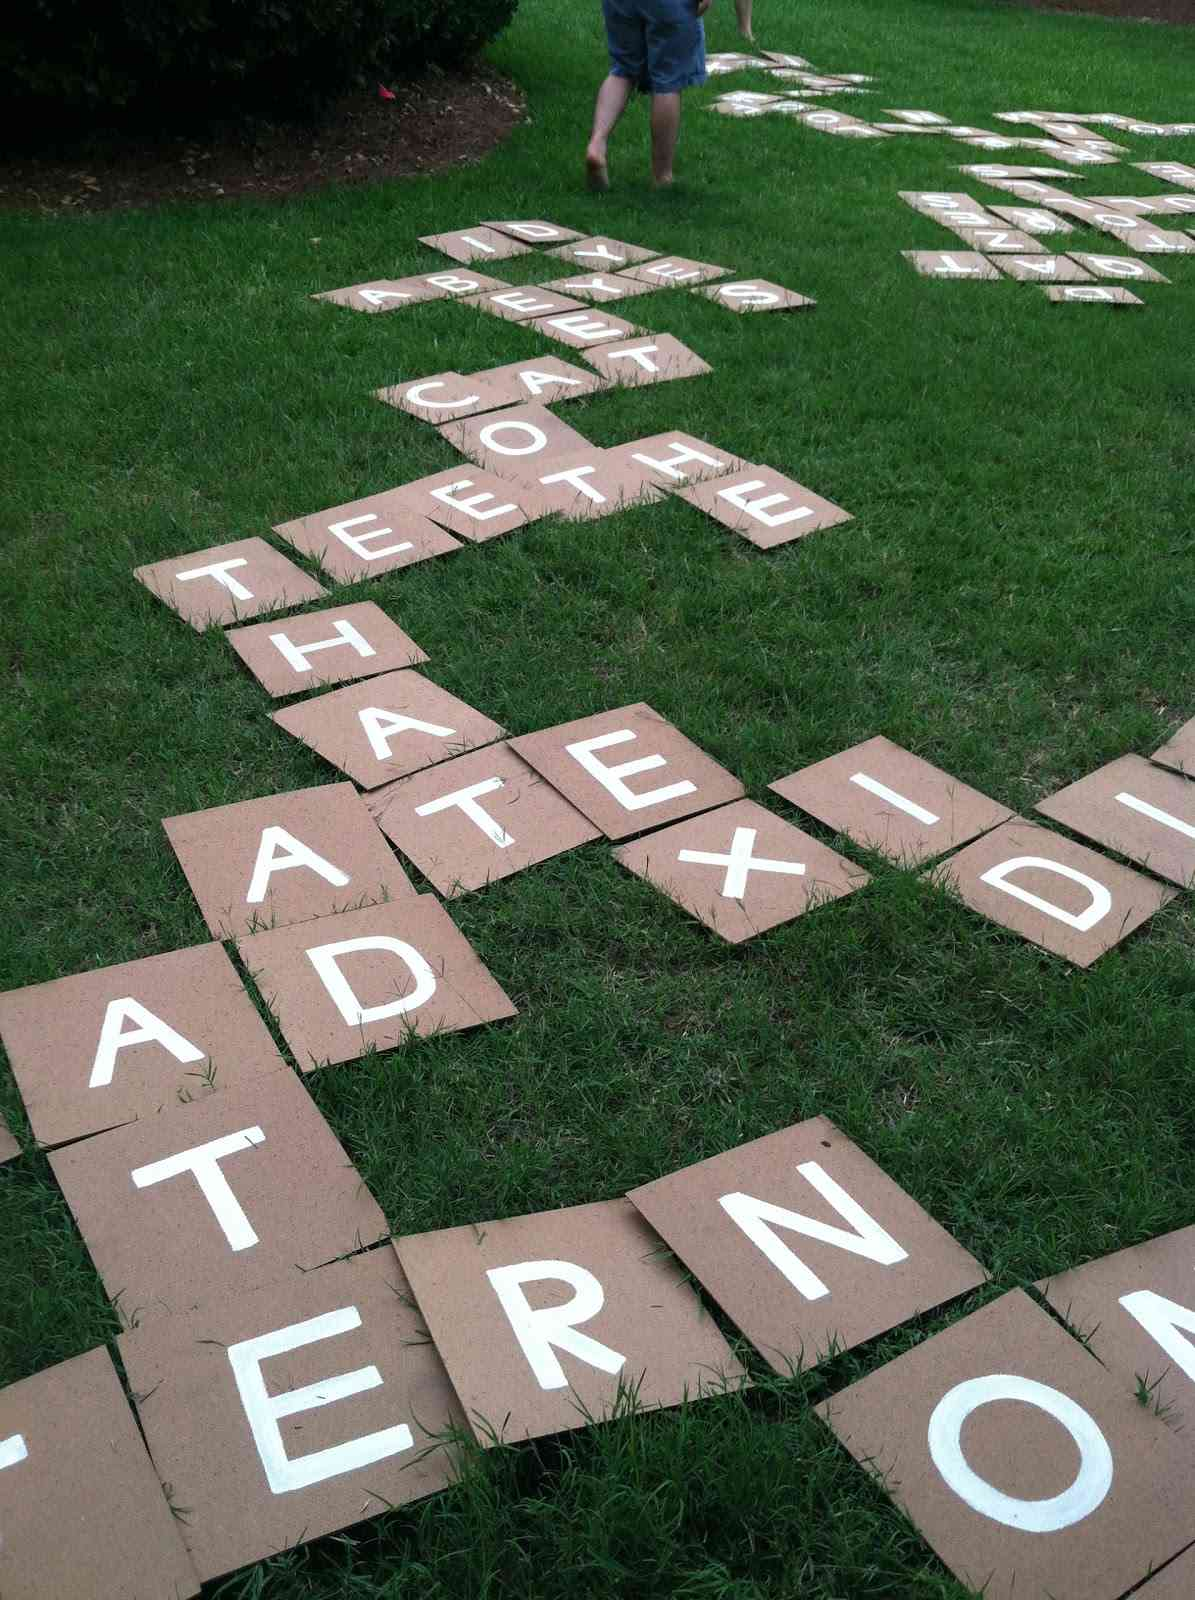 DIY Lawn Scrabble Game